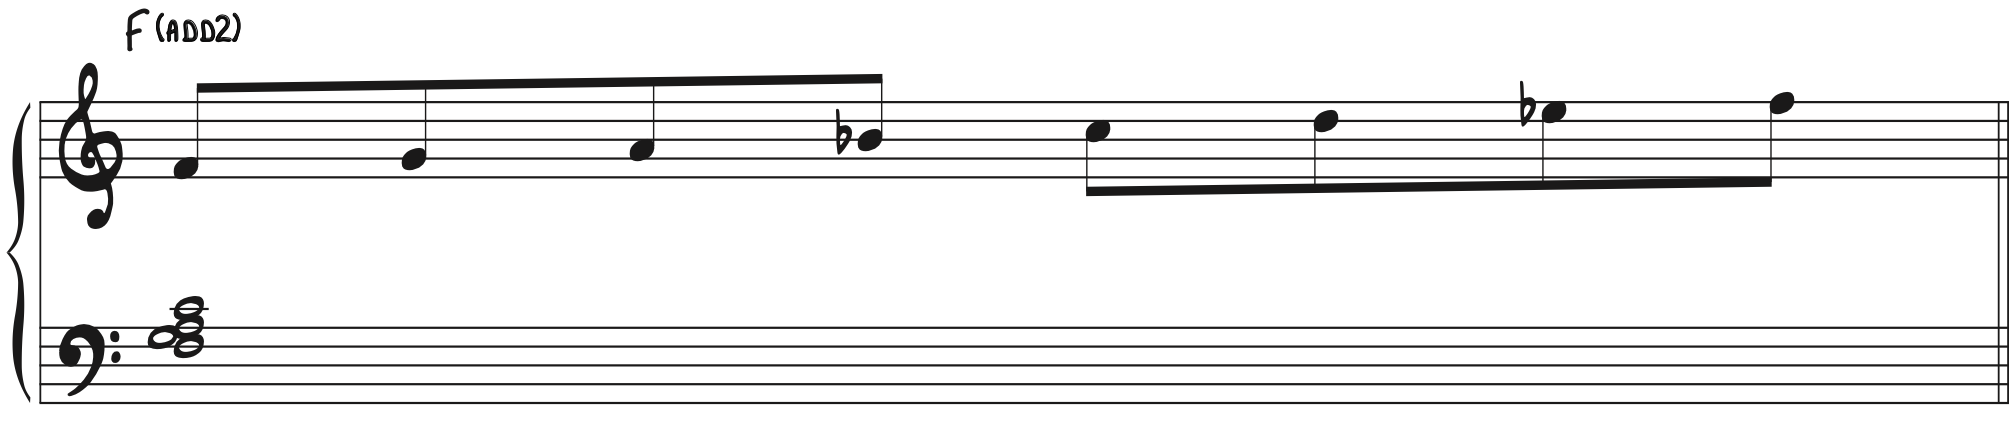 F Mixolydian over F(add2)